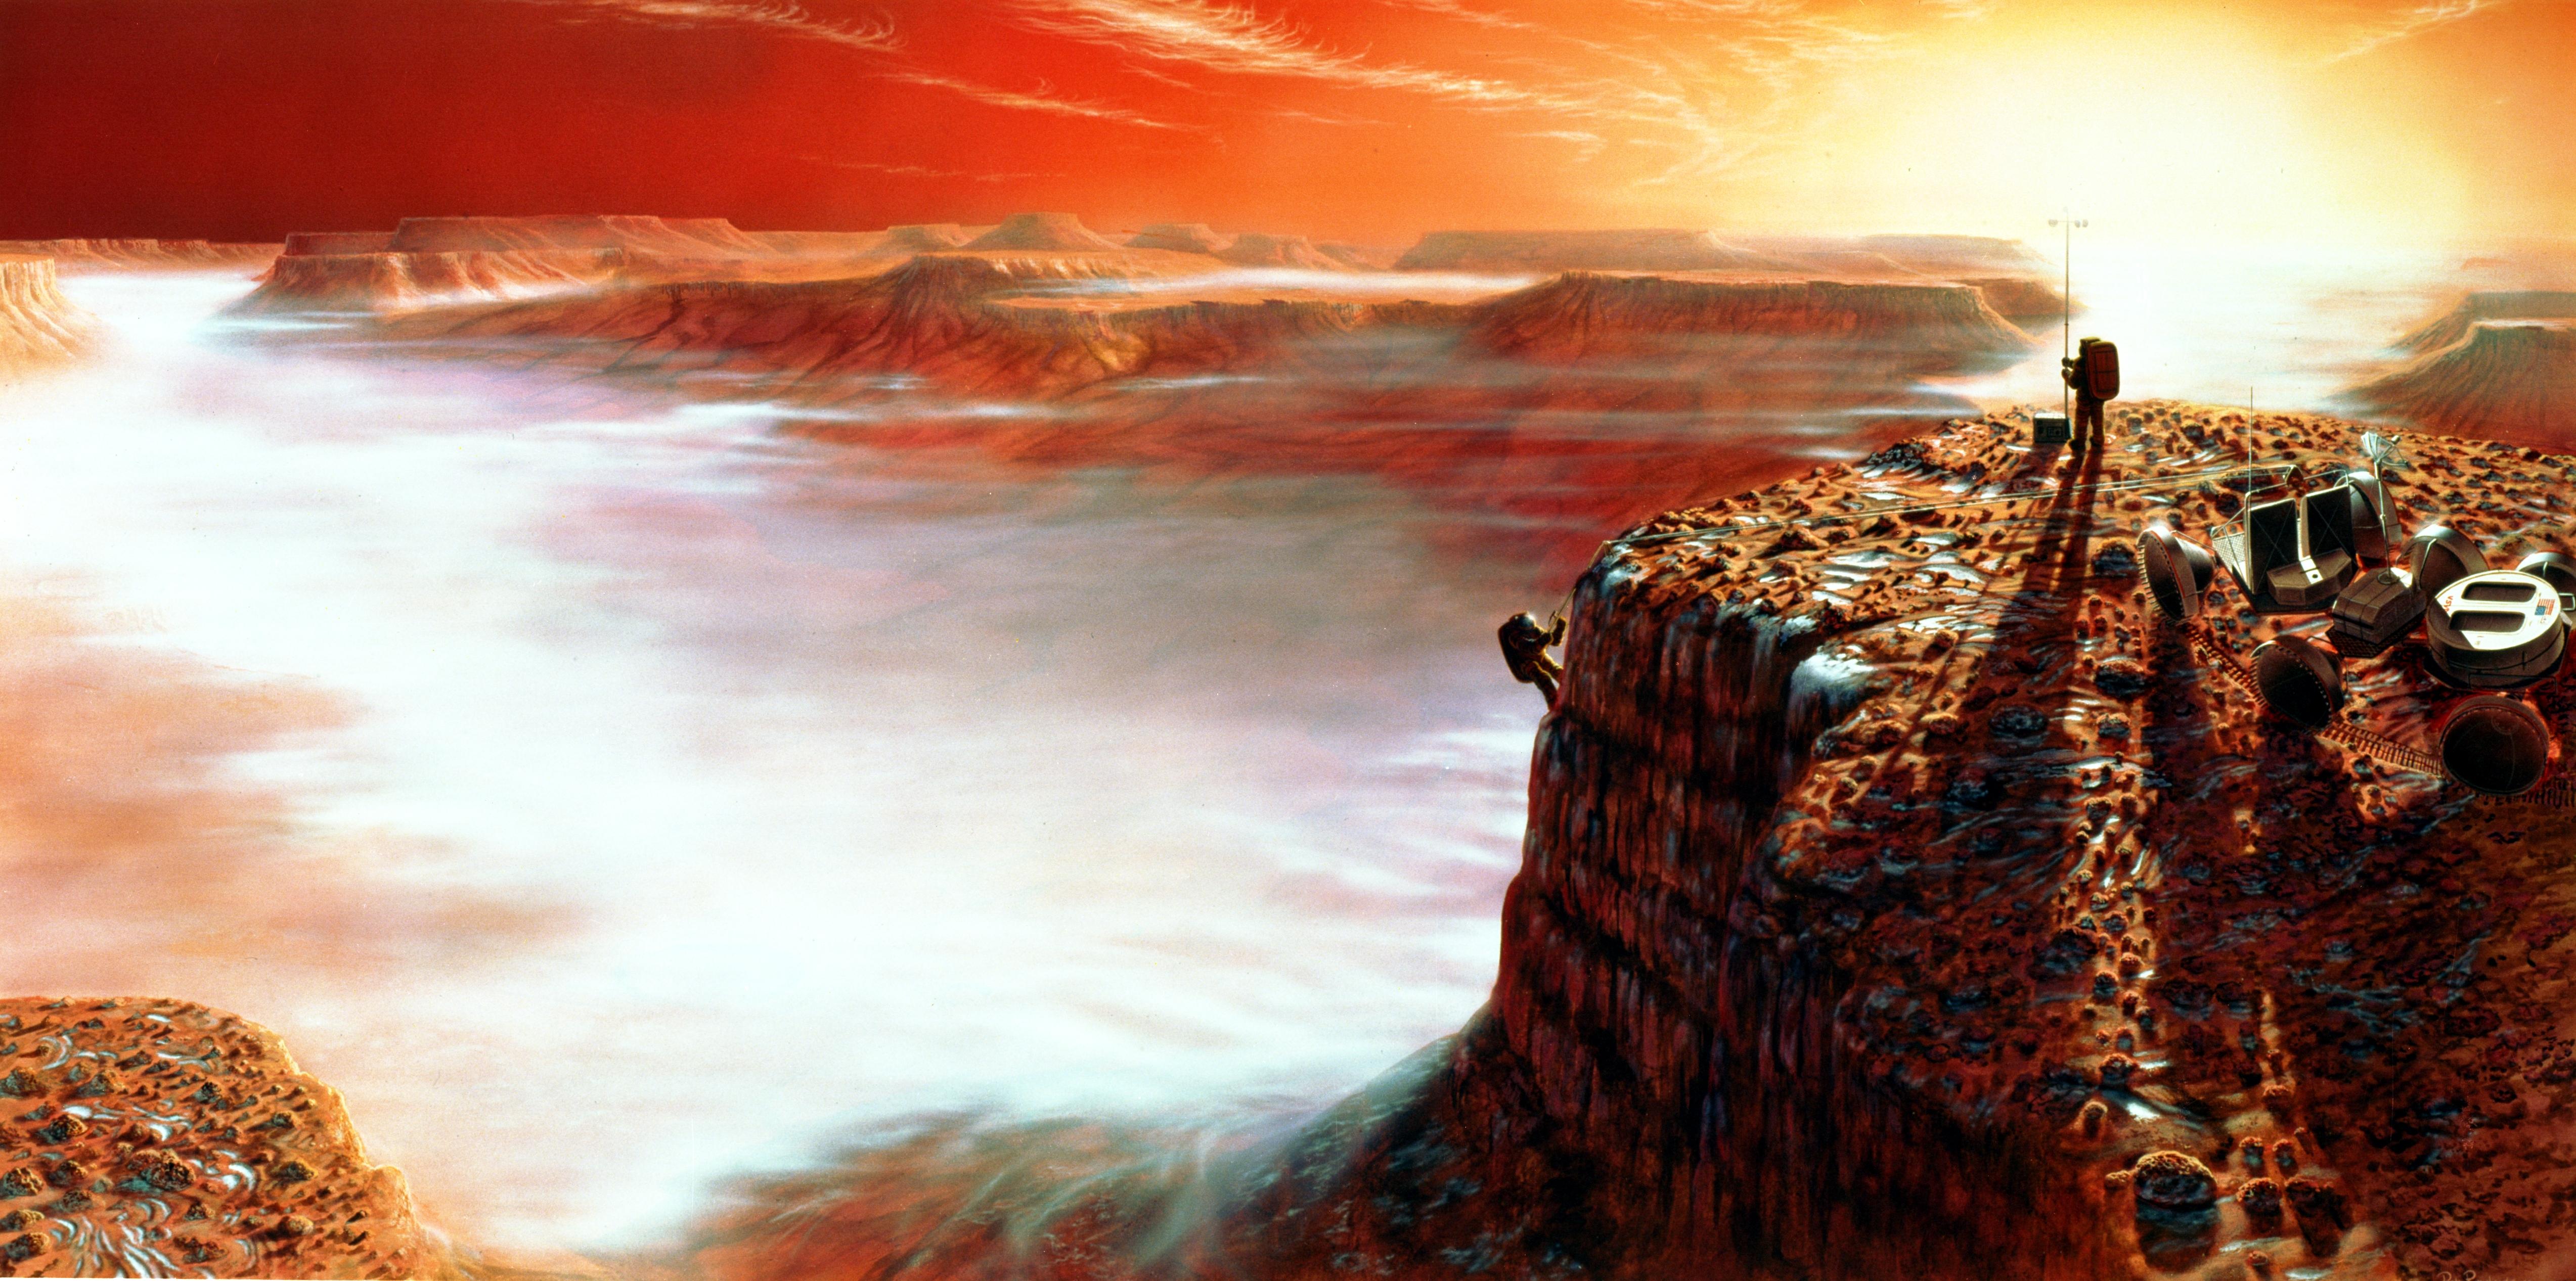 mars canyon nasa - photo #32